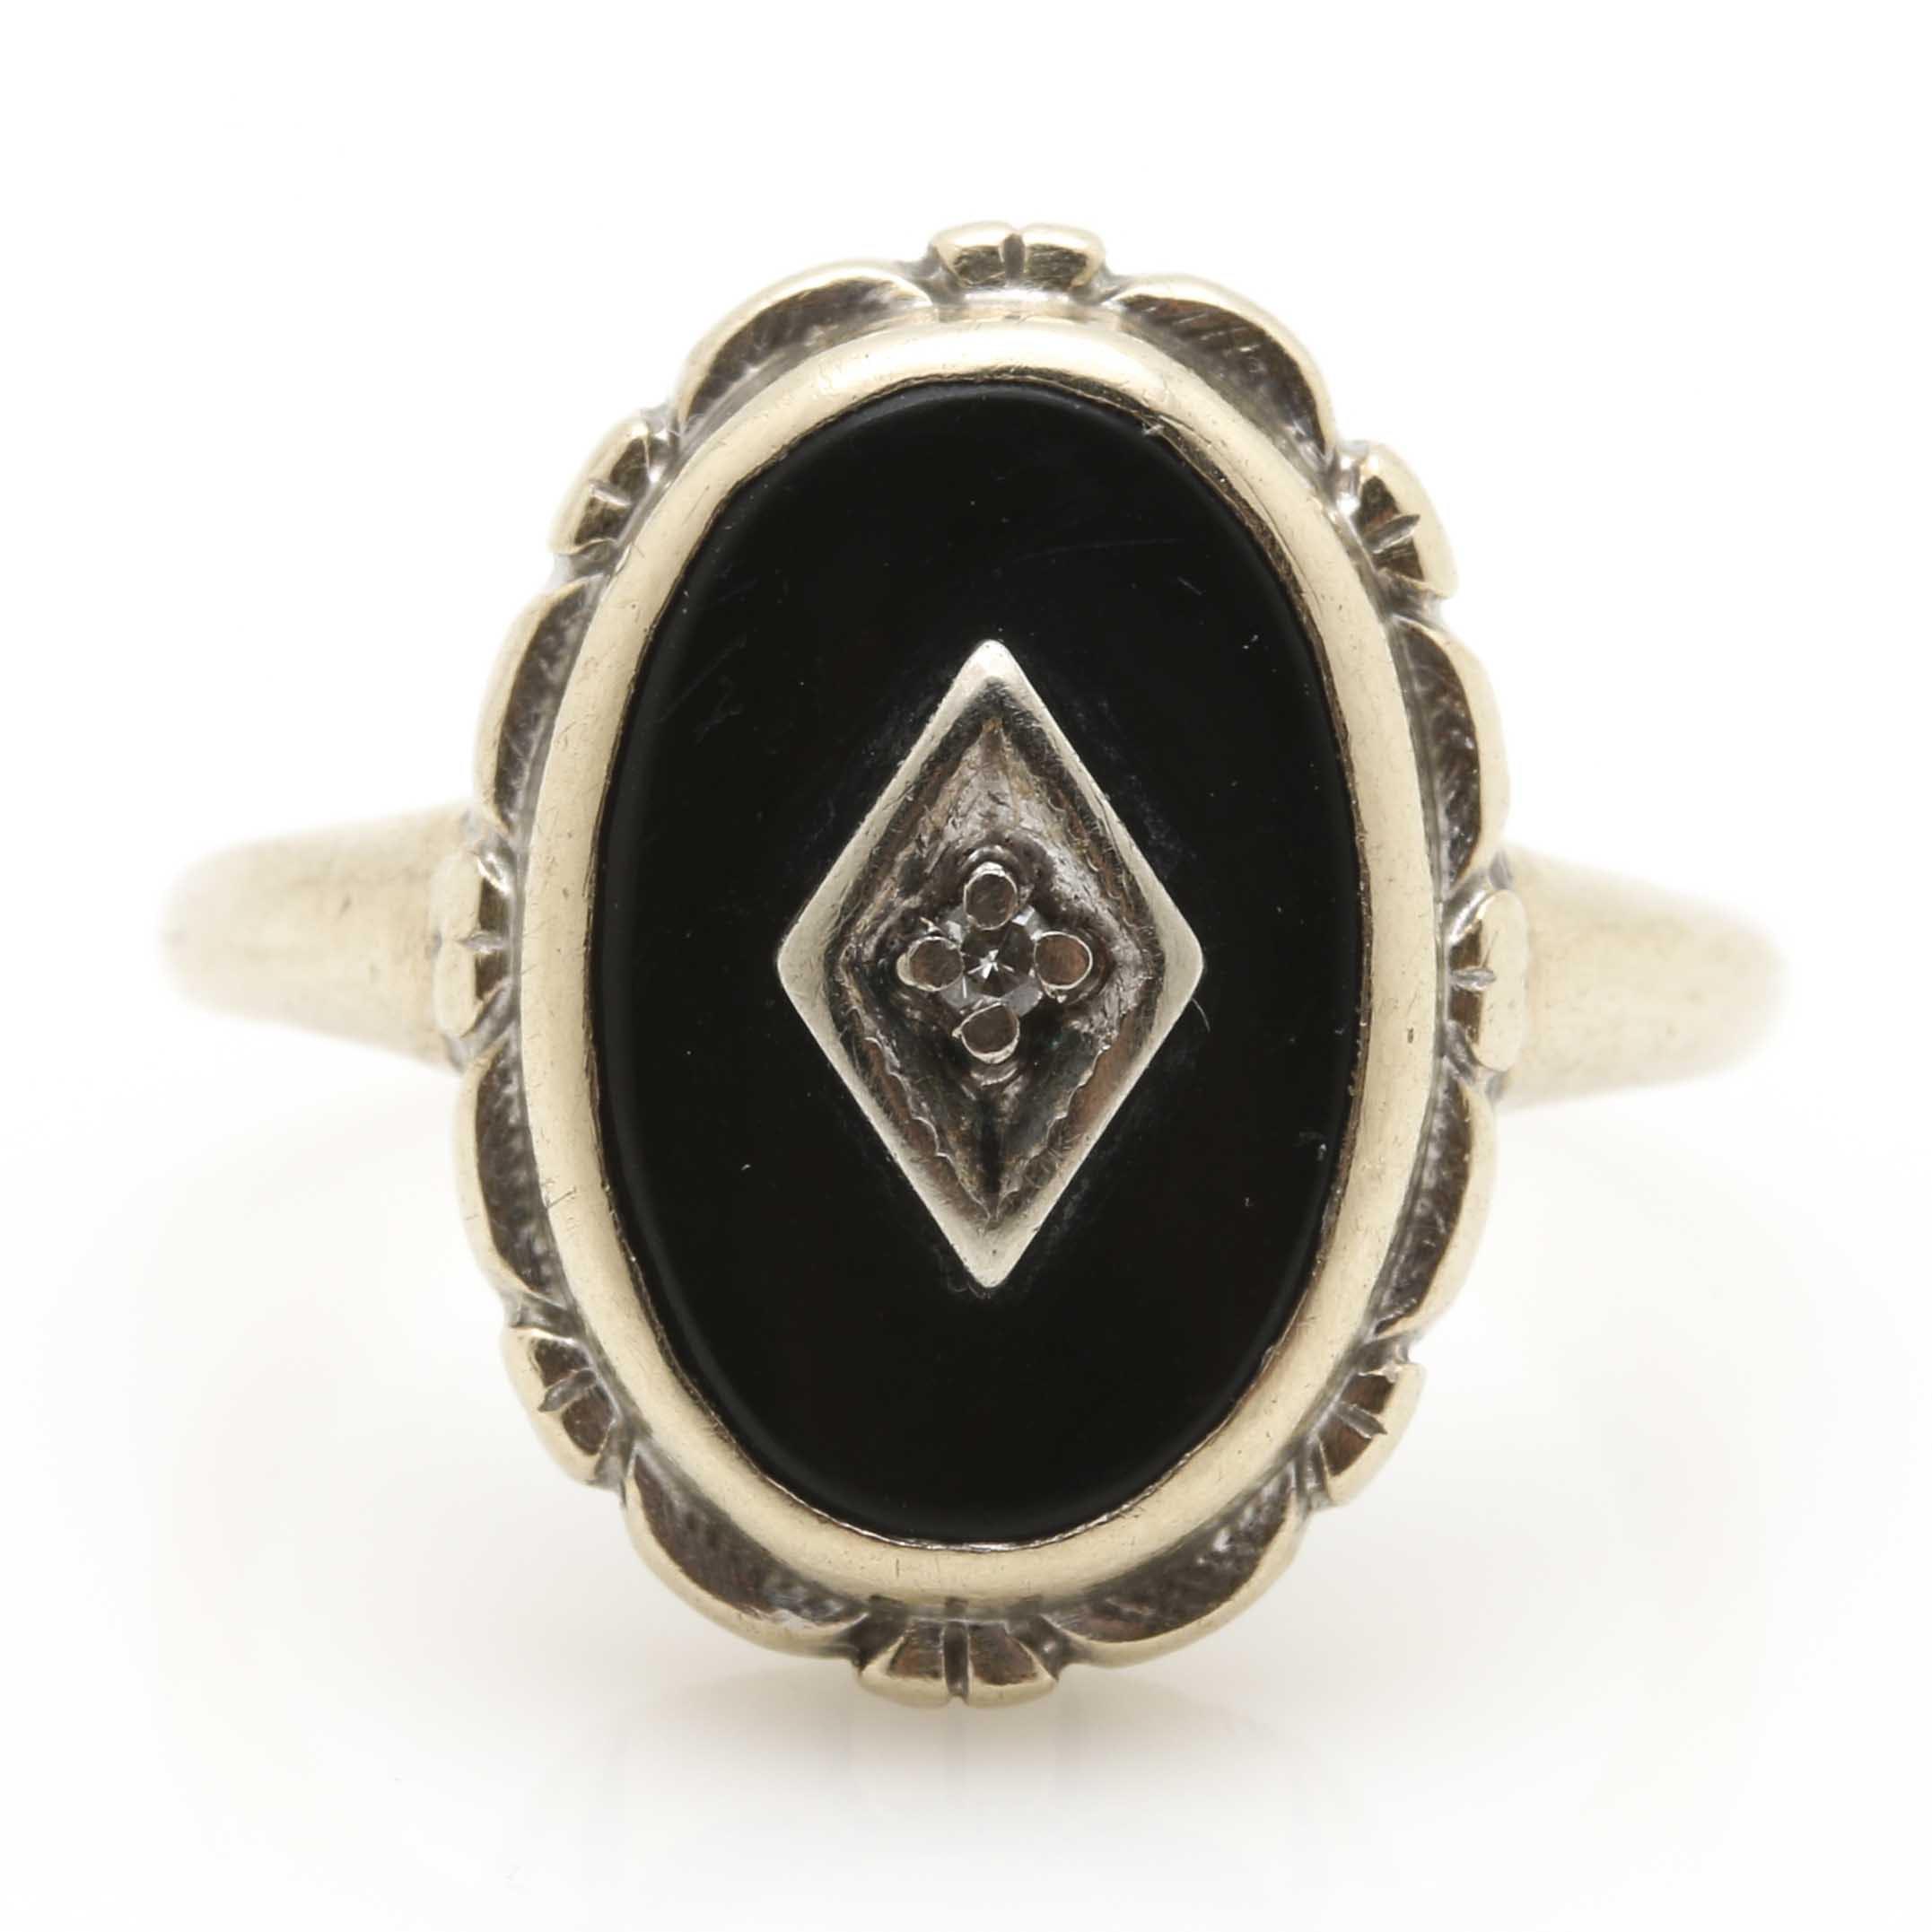 Art Deco Era 14K White Gold Onyx and Diamond Ring